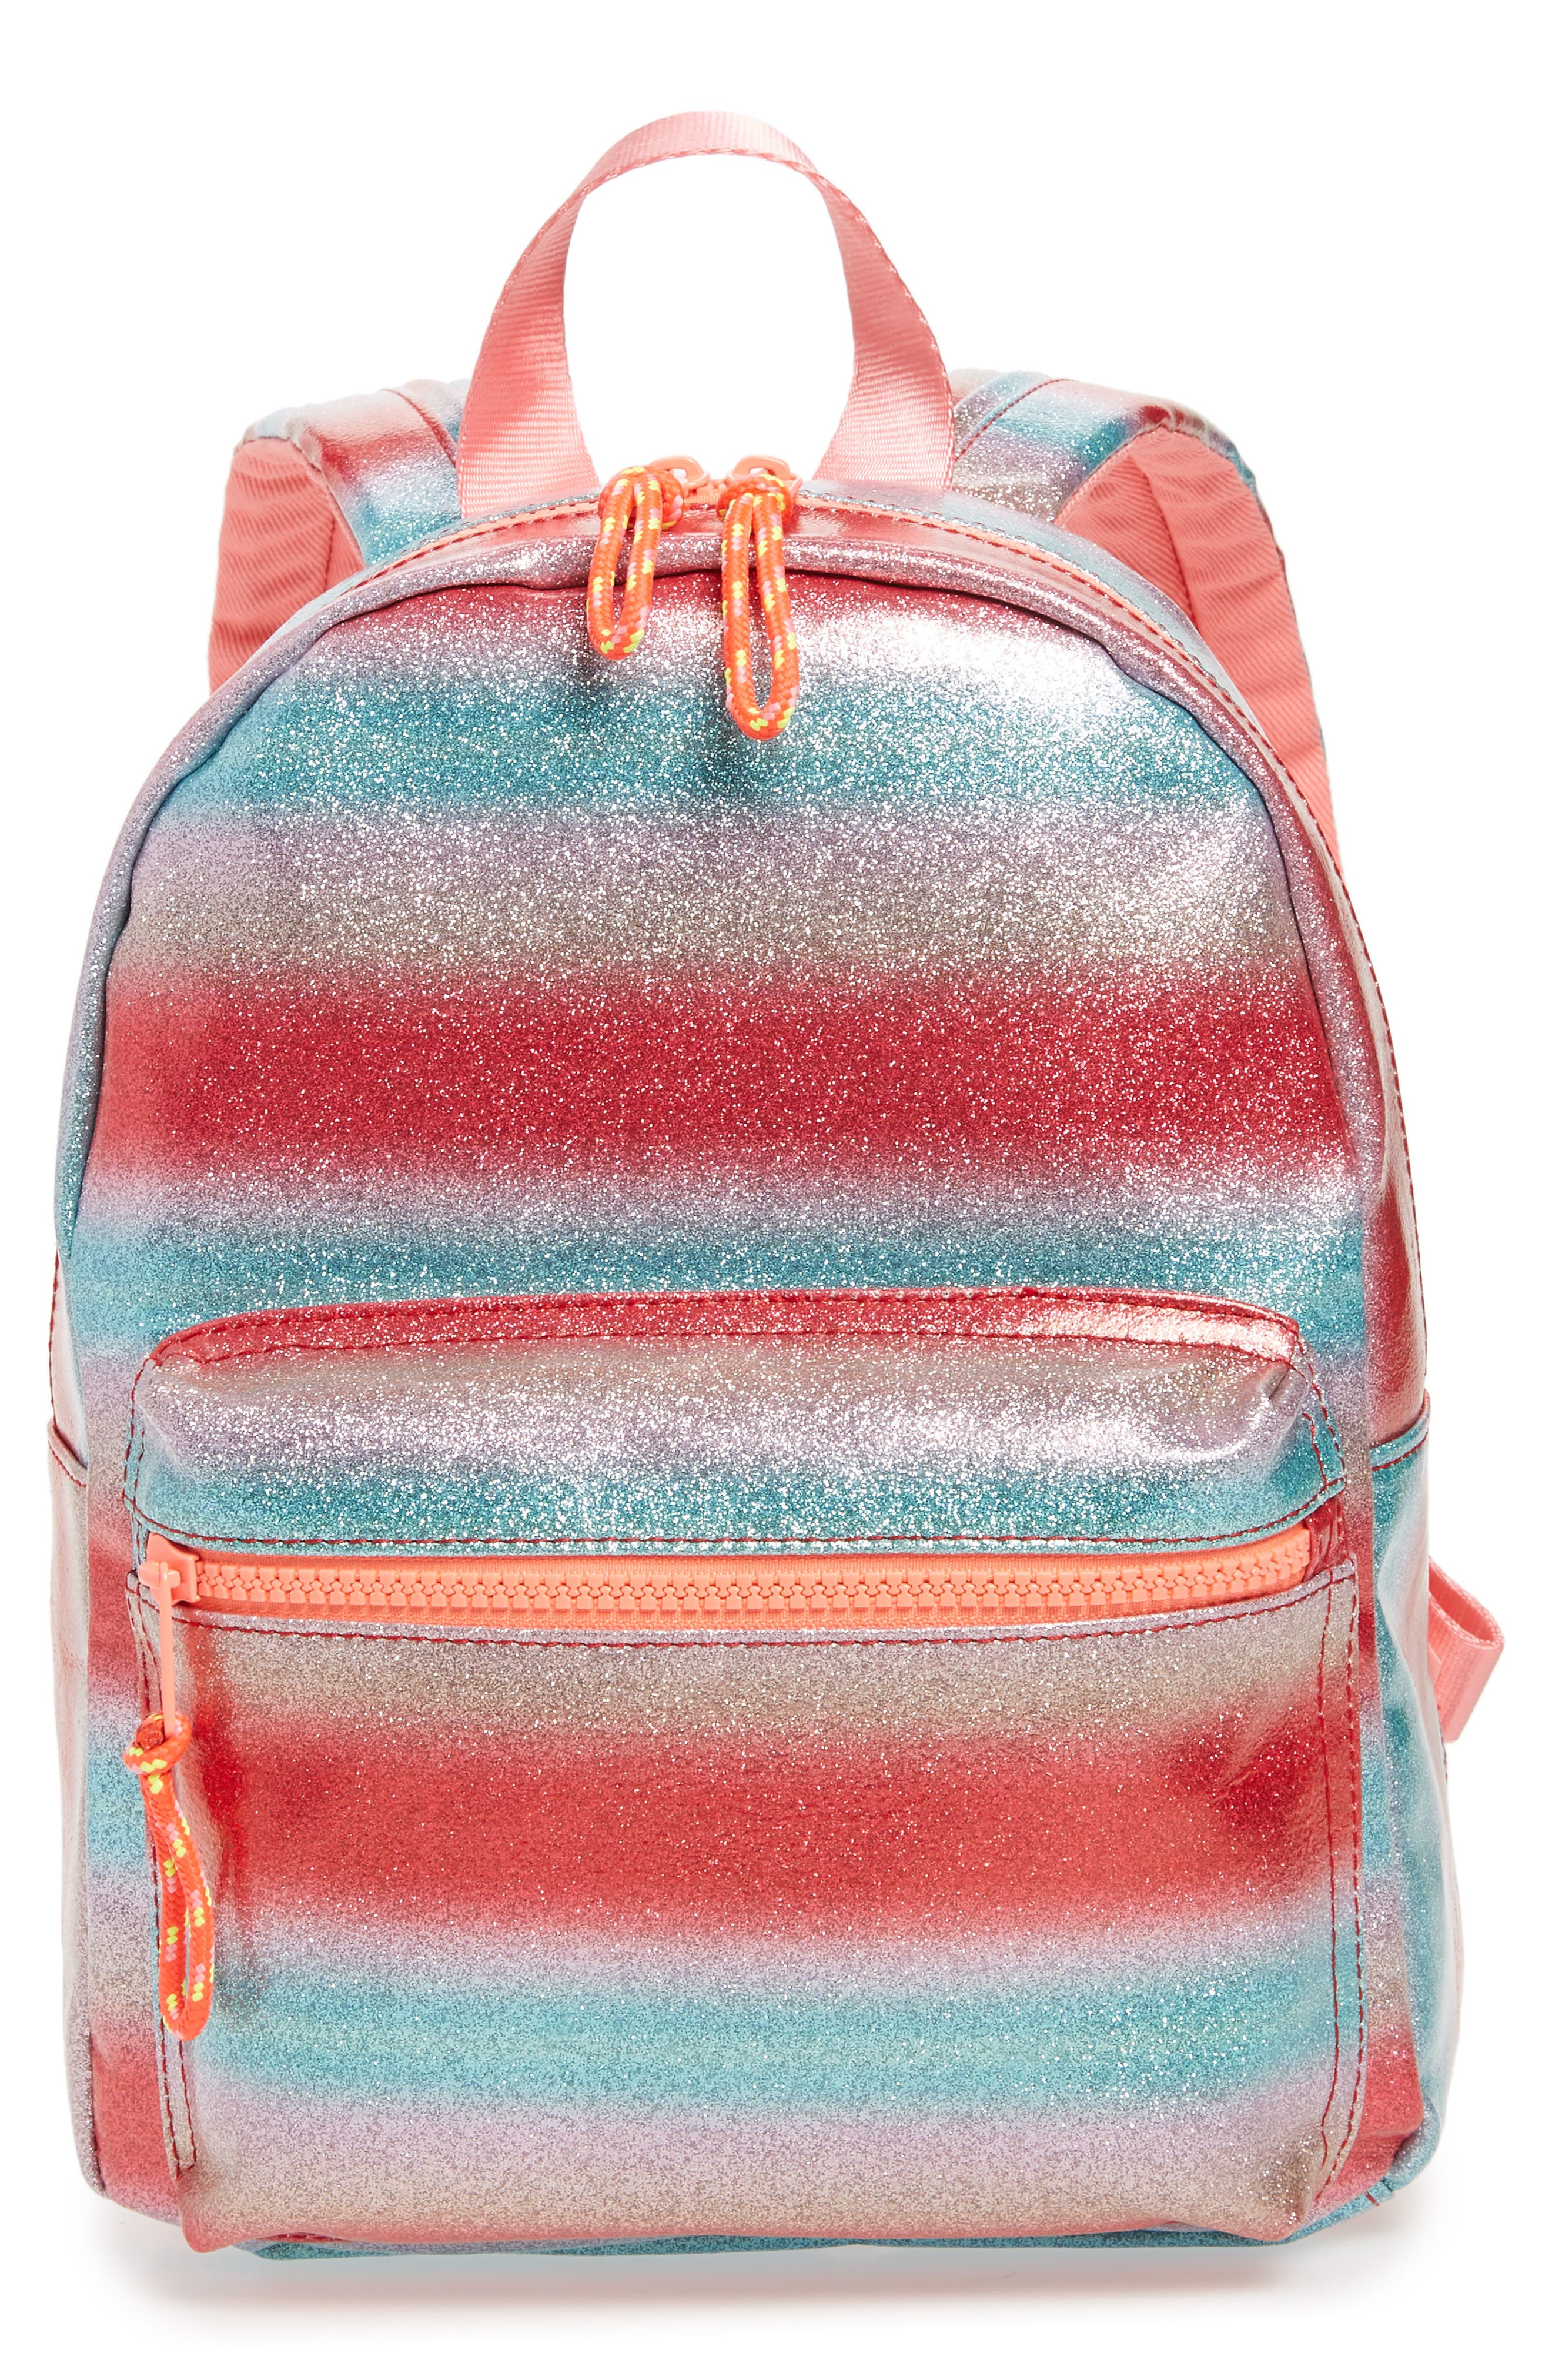 Glitter Mini Backpack,                         Main,                         color, RAINBOW